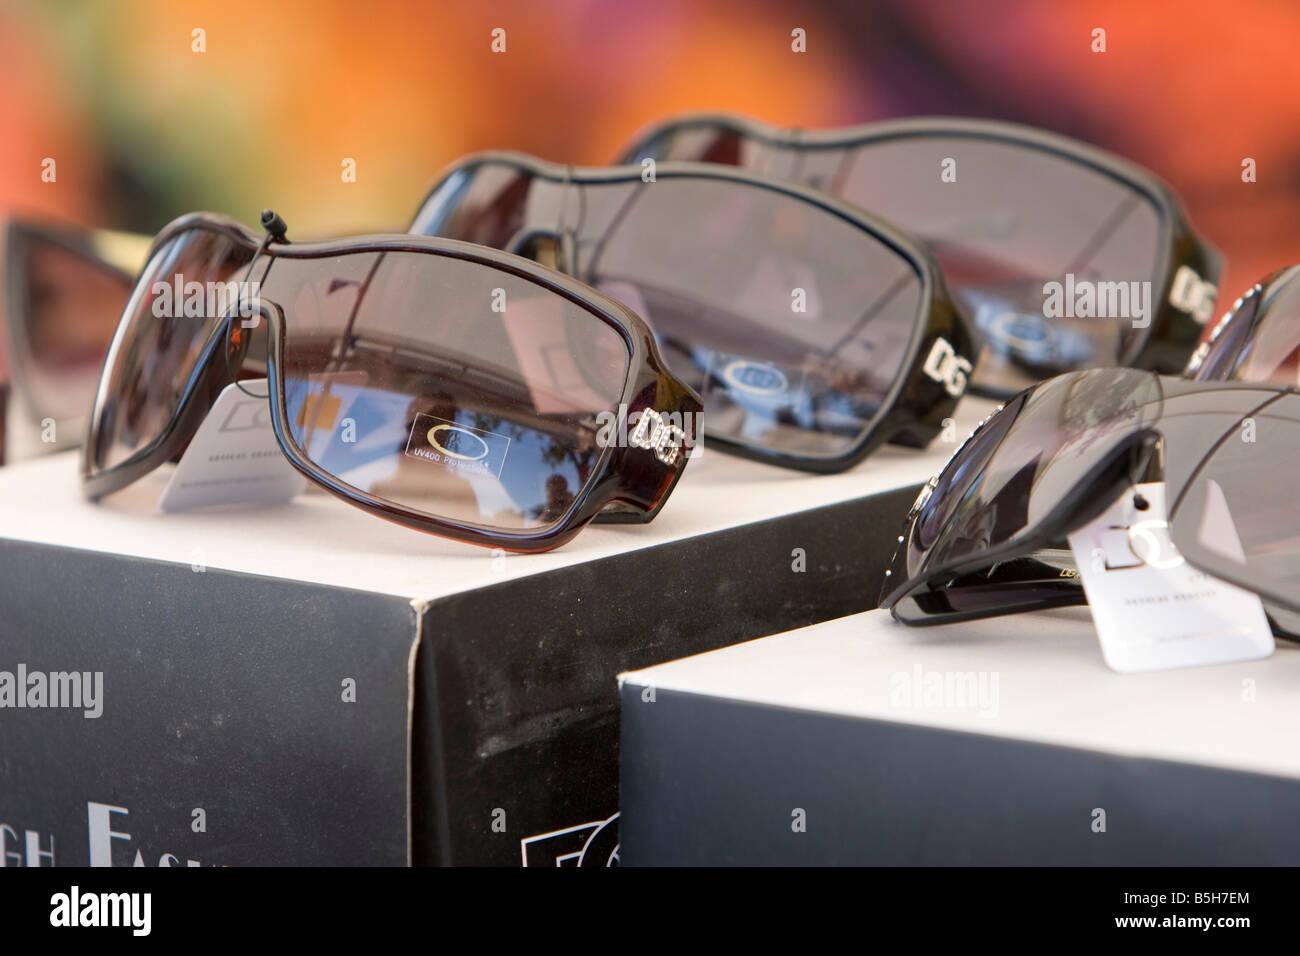 DG sunglasses for sale 30 08 2008 - Stock Image